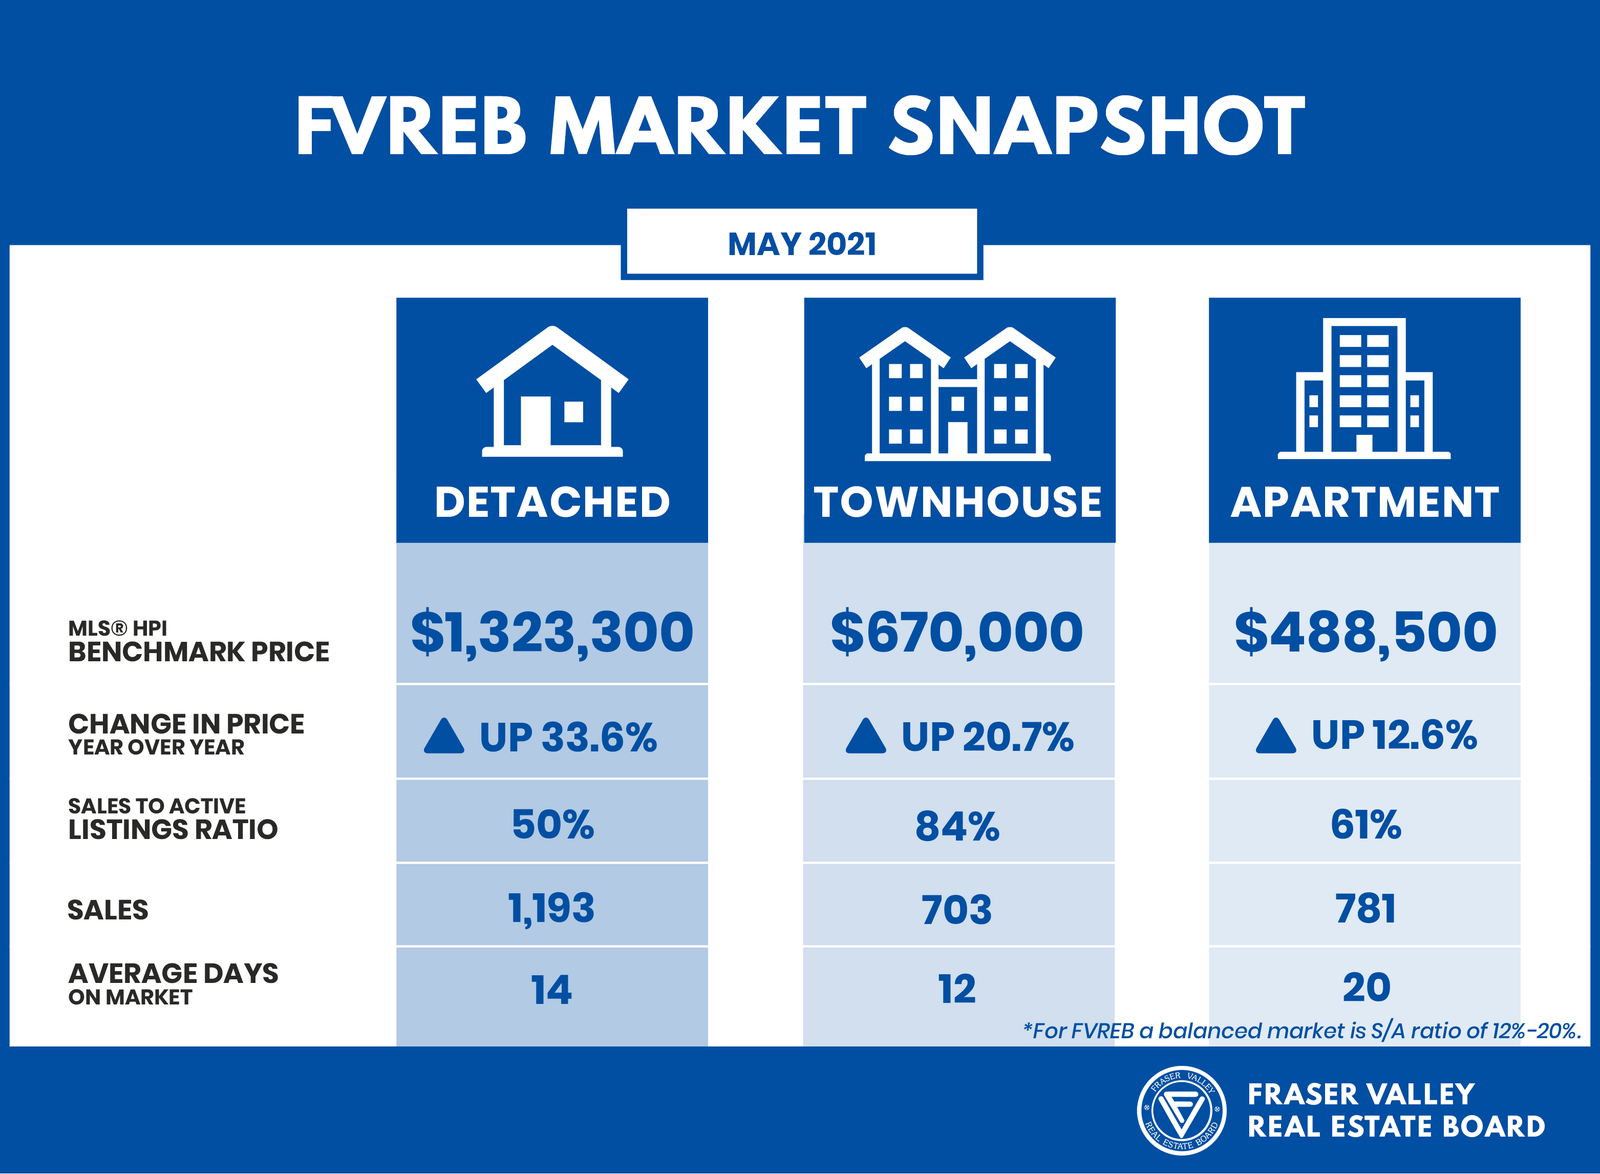 Market Snapshot for May 2021 - Fraser Valley Real Estate